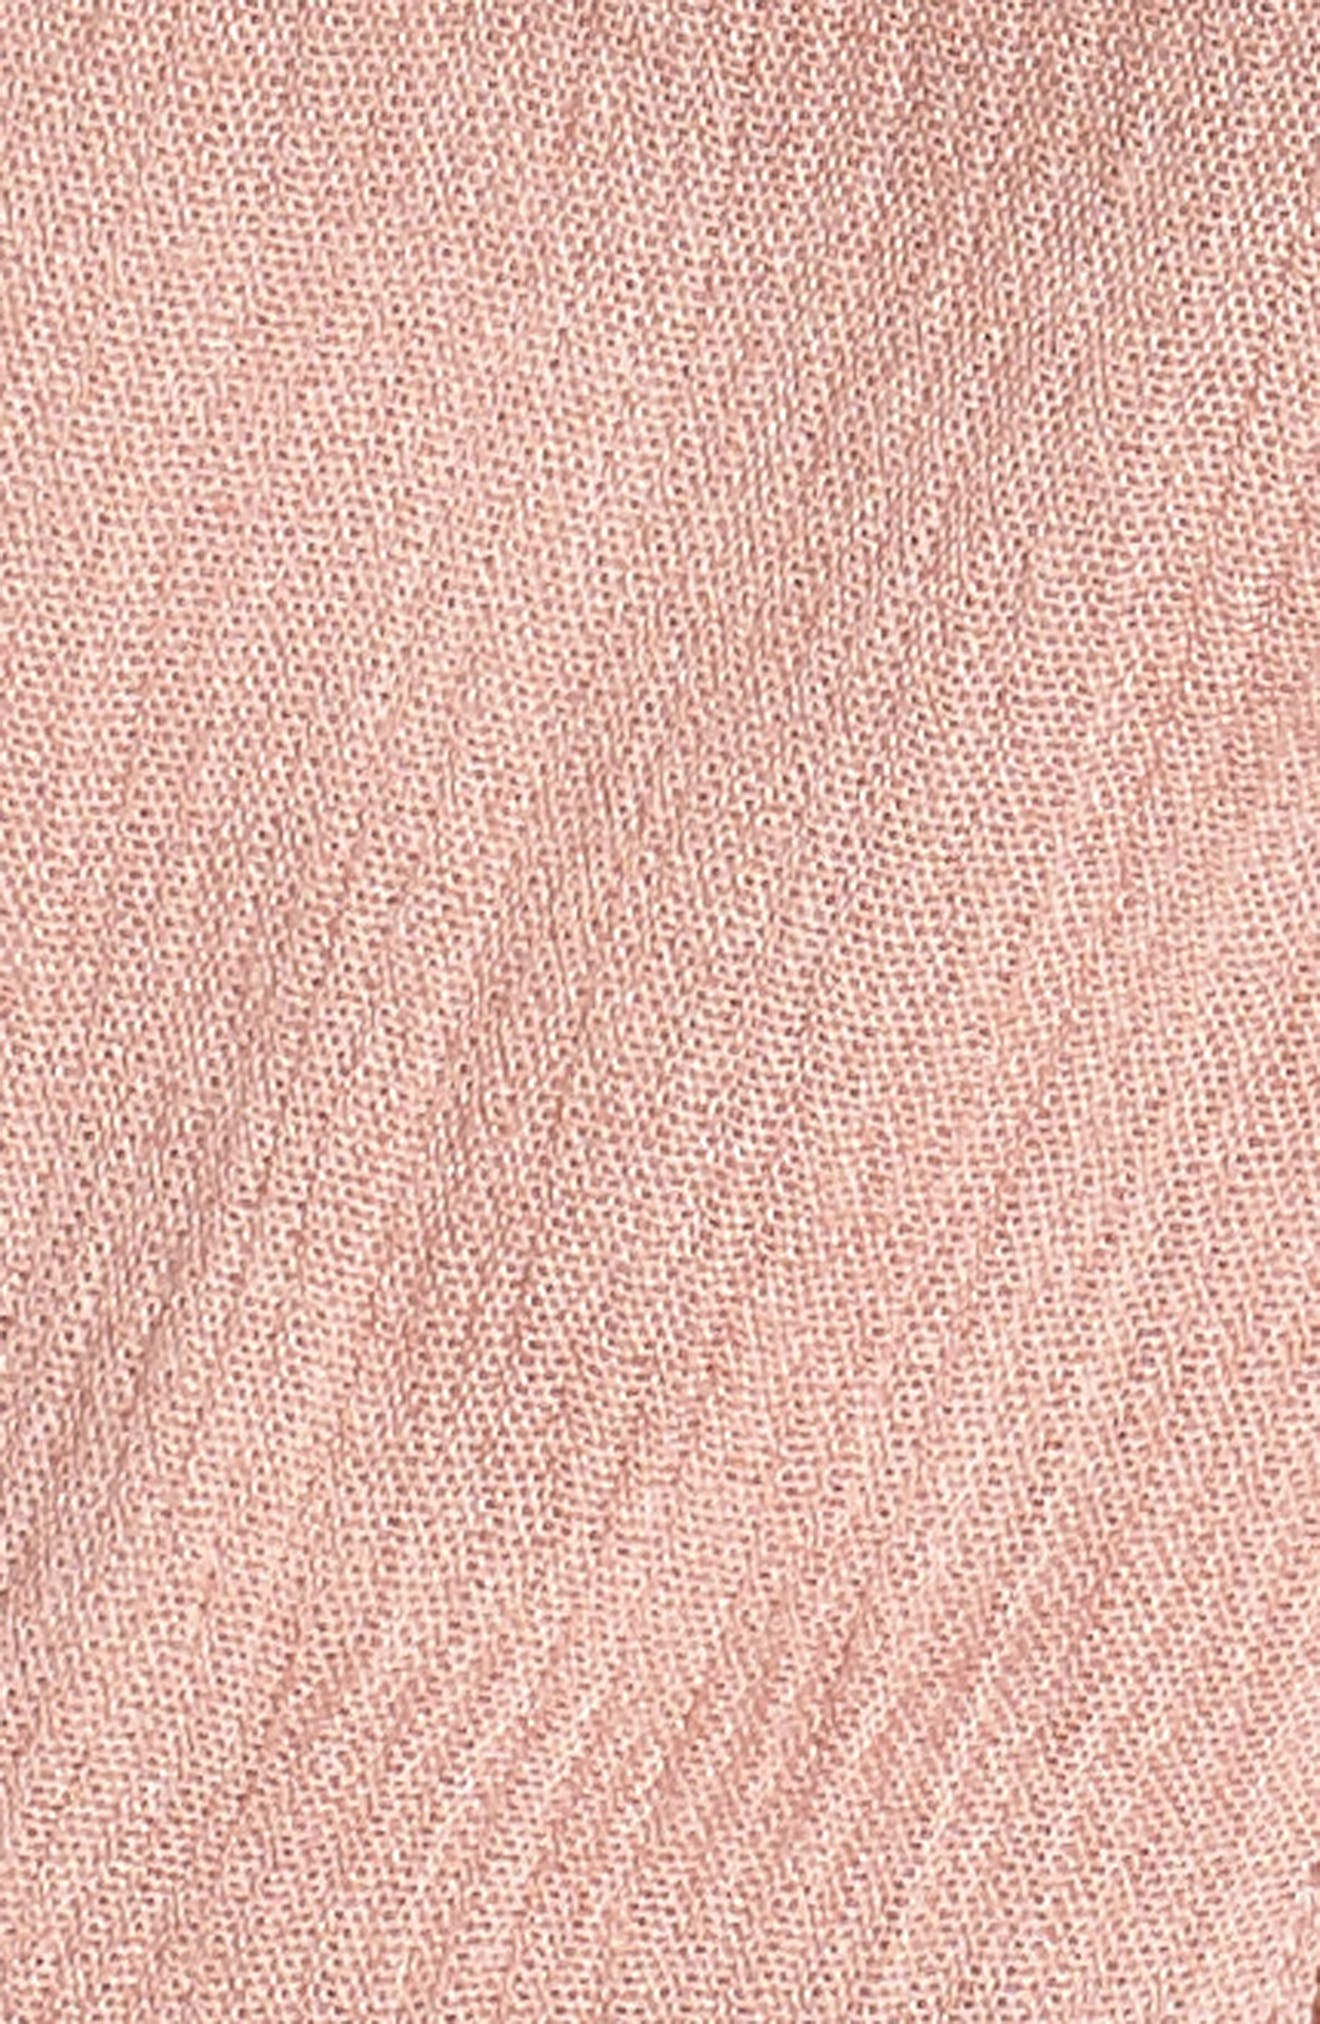 Ladder Trim Midi Dress,                             Alternate thumbnail 14, color,